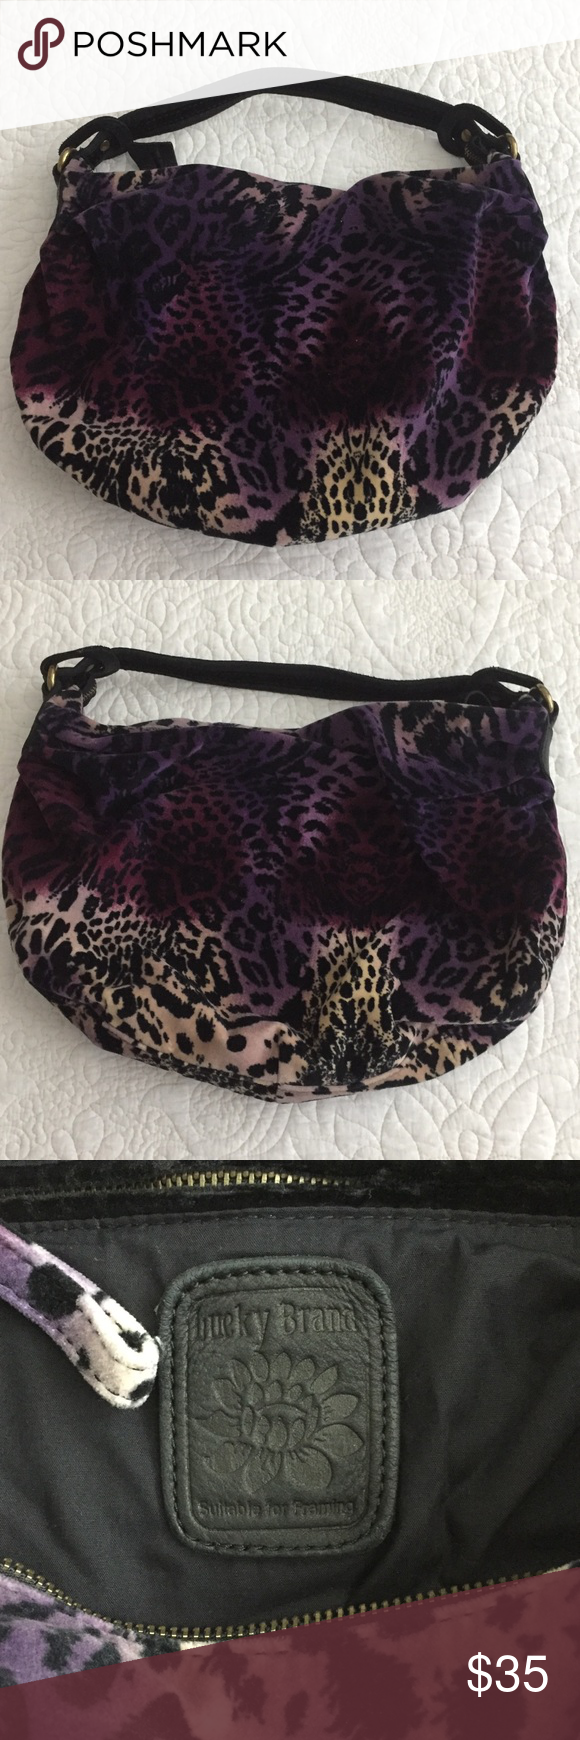 d9e4deb094 Lucky Brand Rainbow Cheetah Hobo Bag Super cute bag!! Pet smoke free. Lucky  Brand Bags Hobos